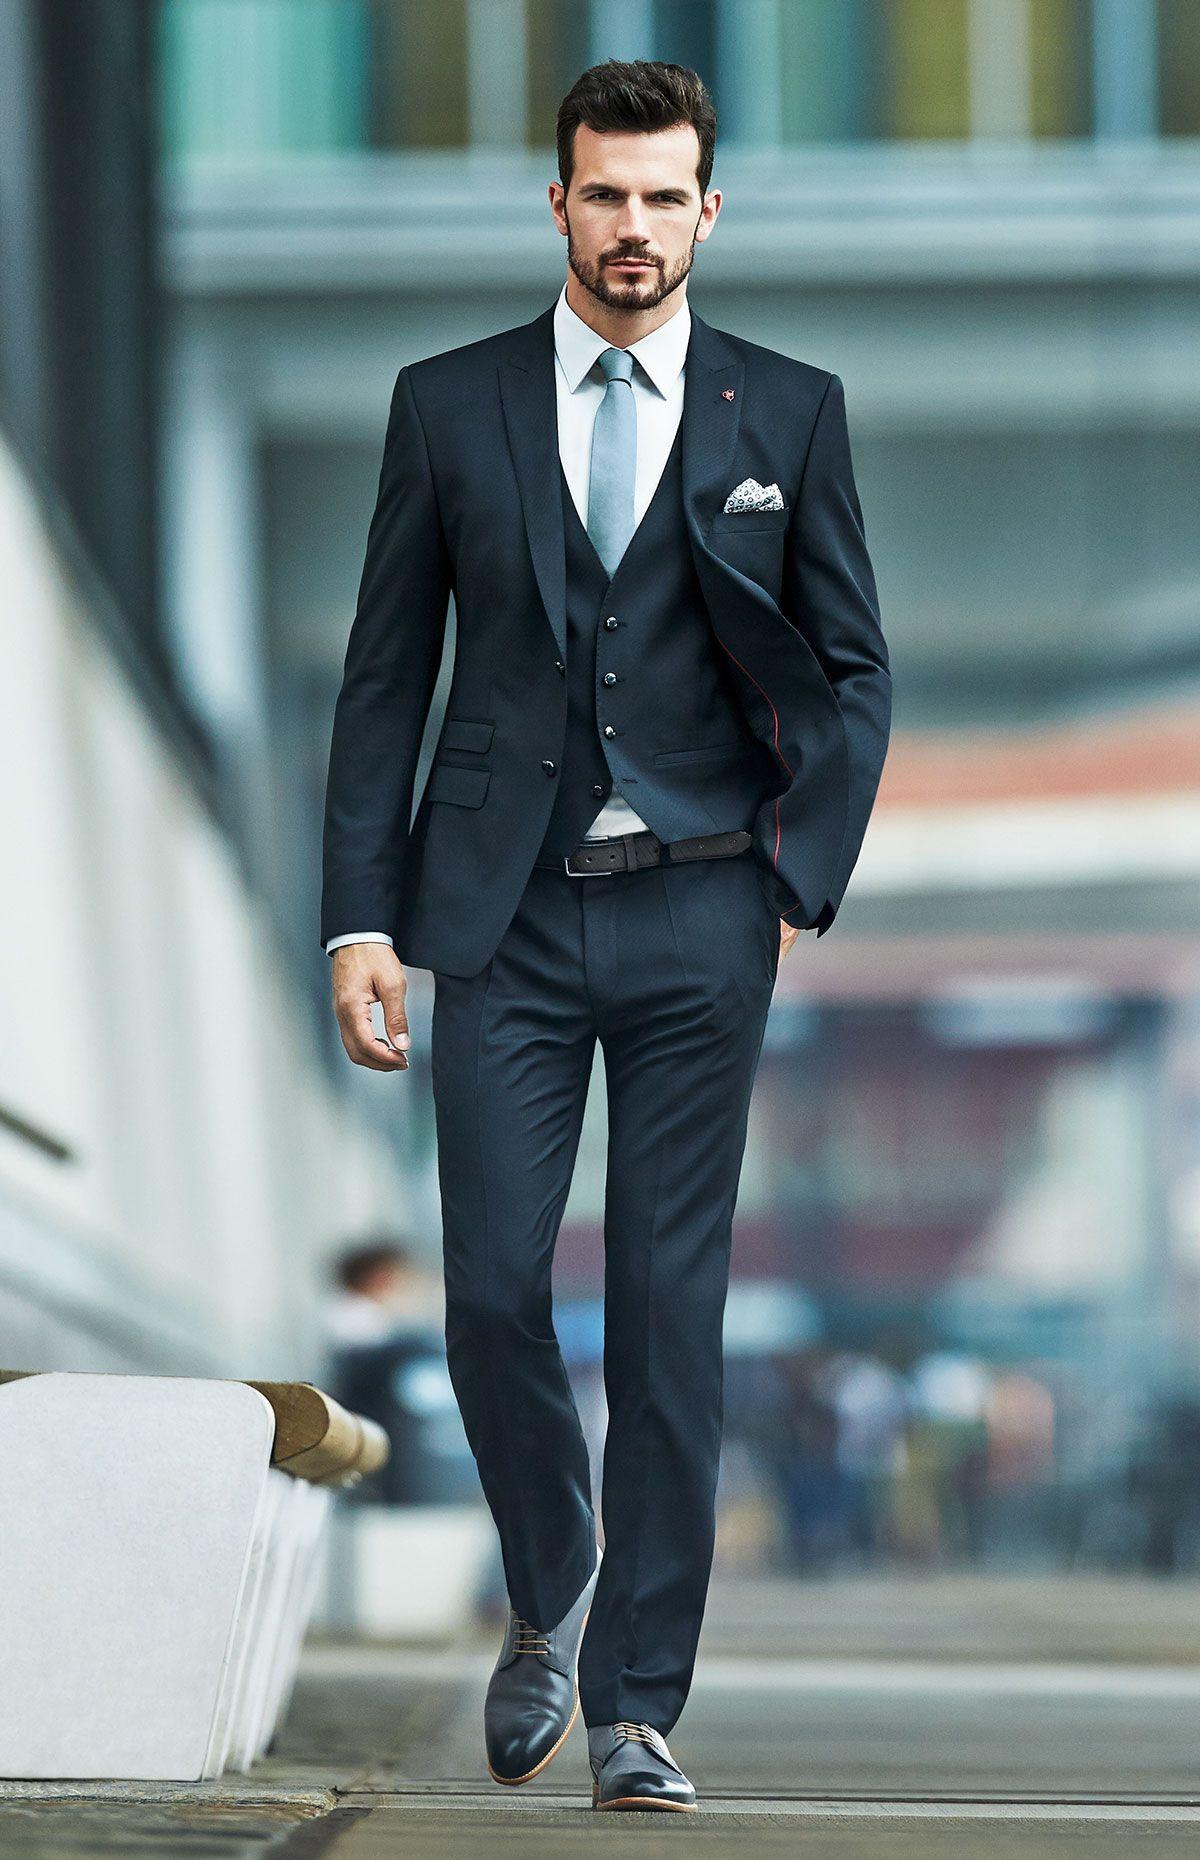 roy robson fr�hling 2015 moda maschile pinterest mens  roy robson fr�hling 2015